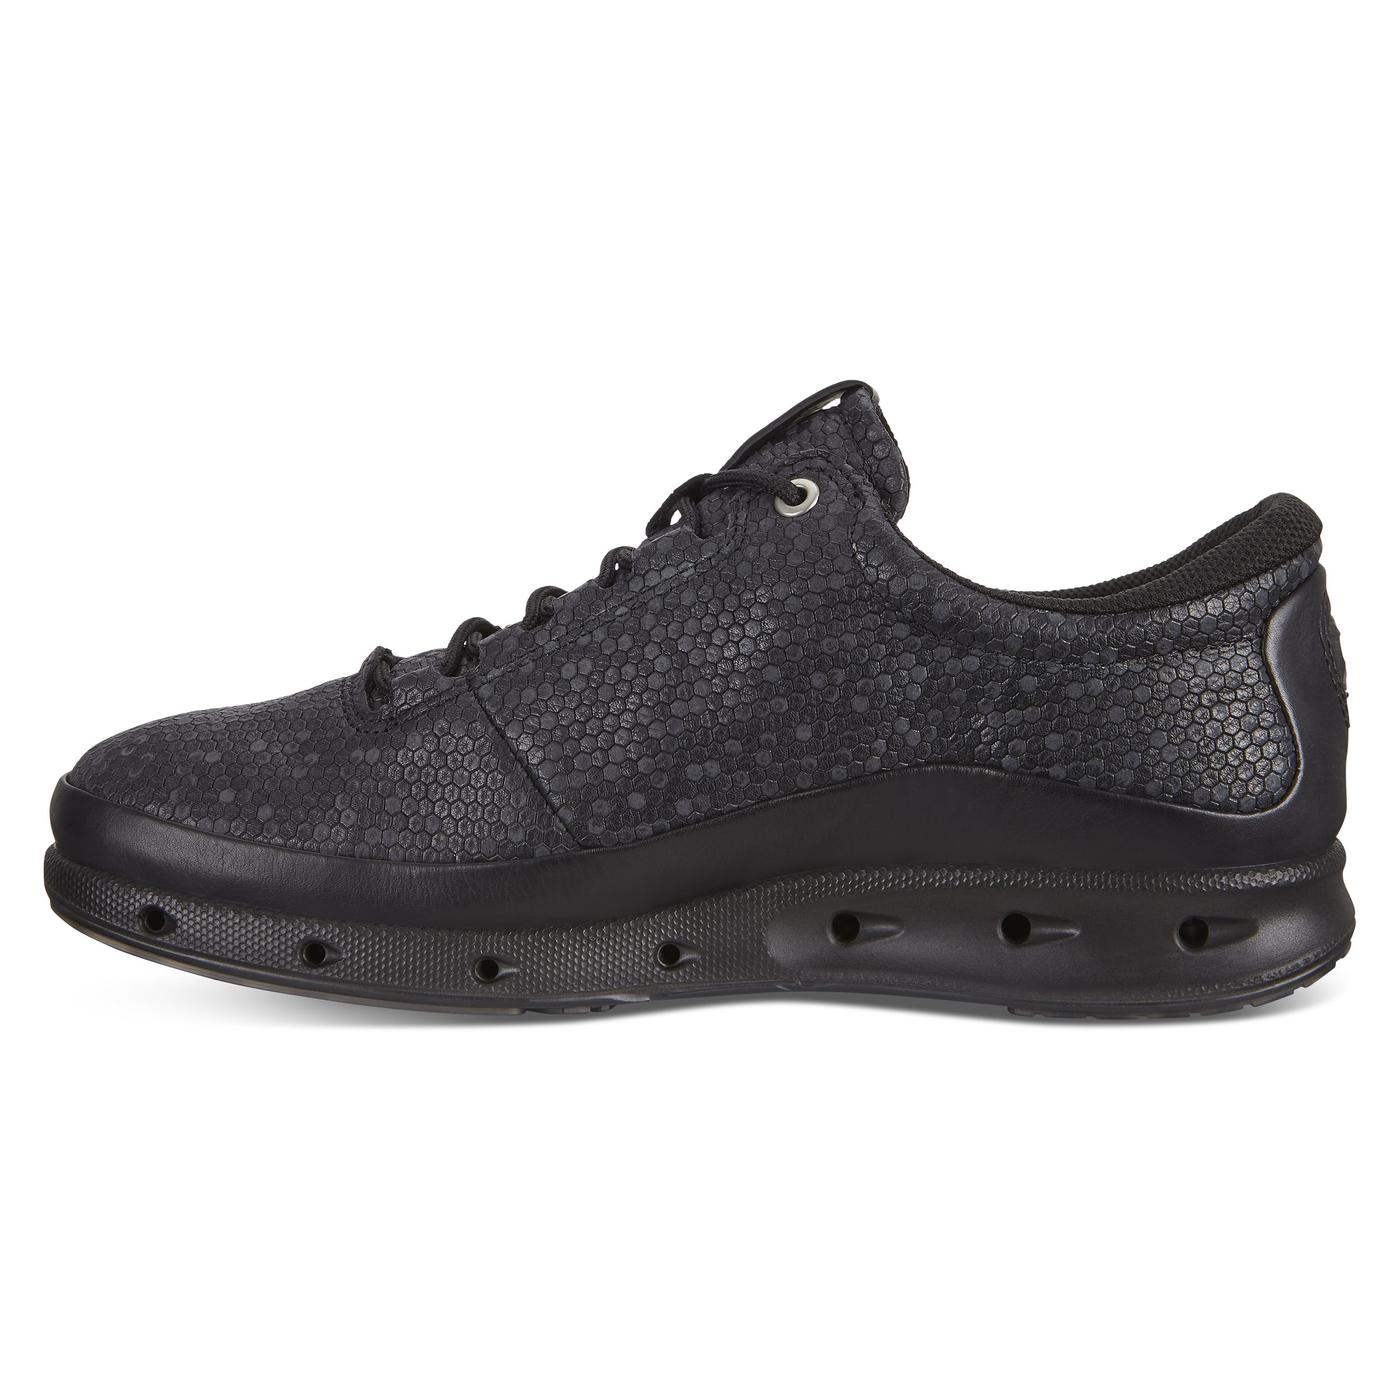 ECCO COOL M Shoe